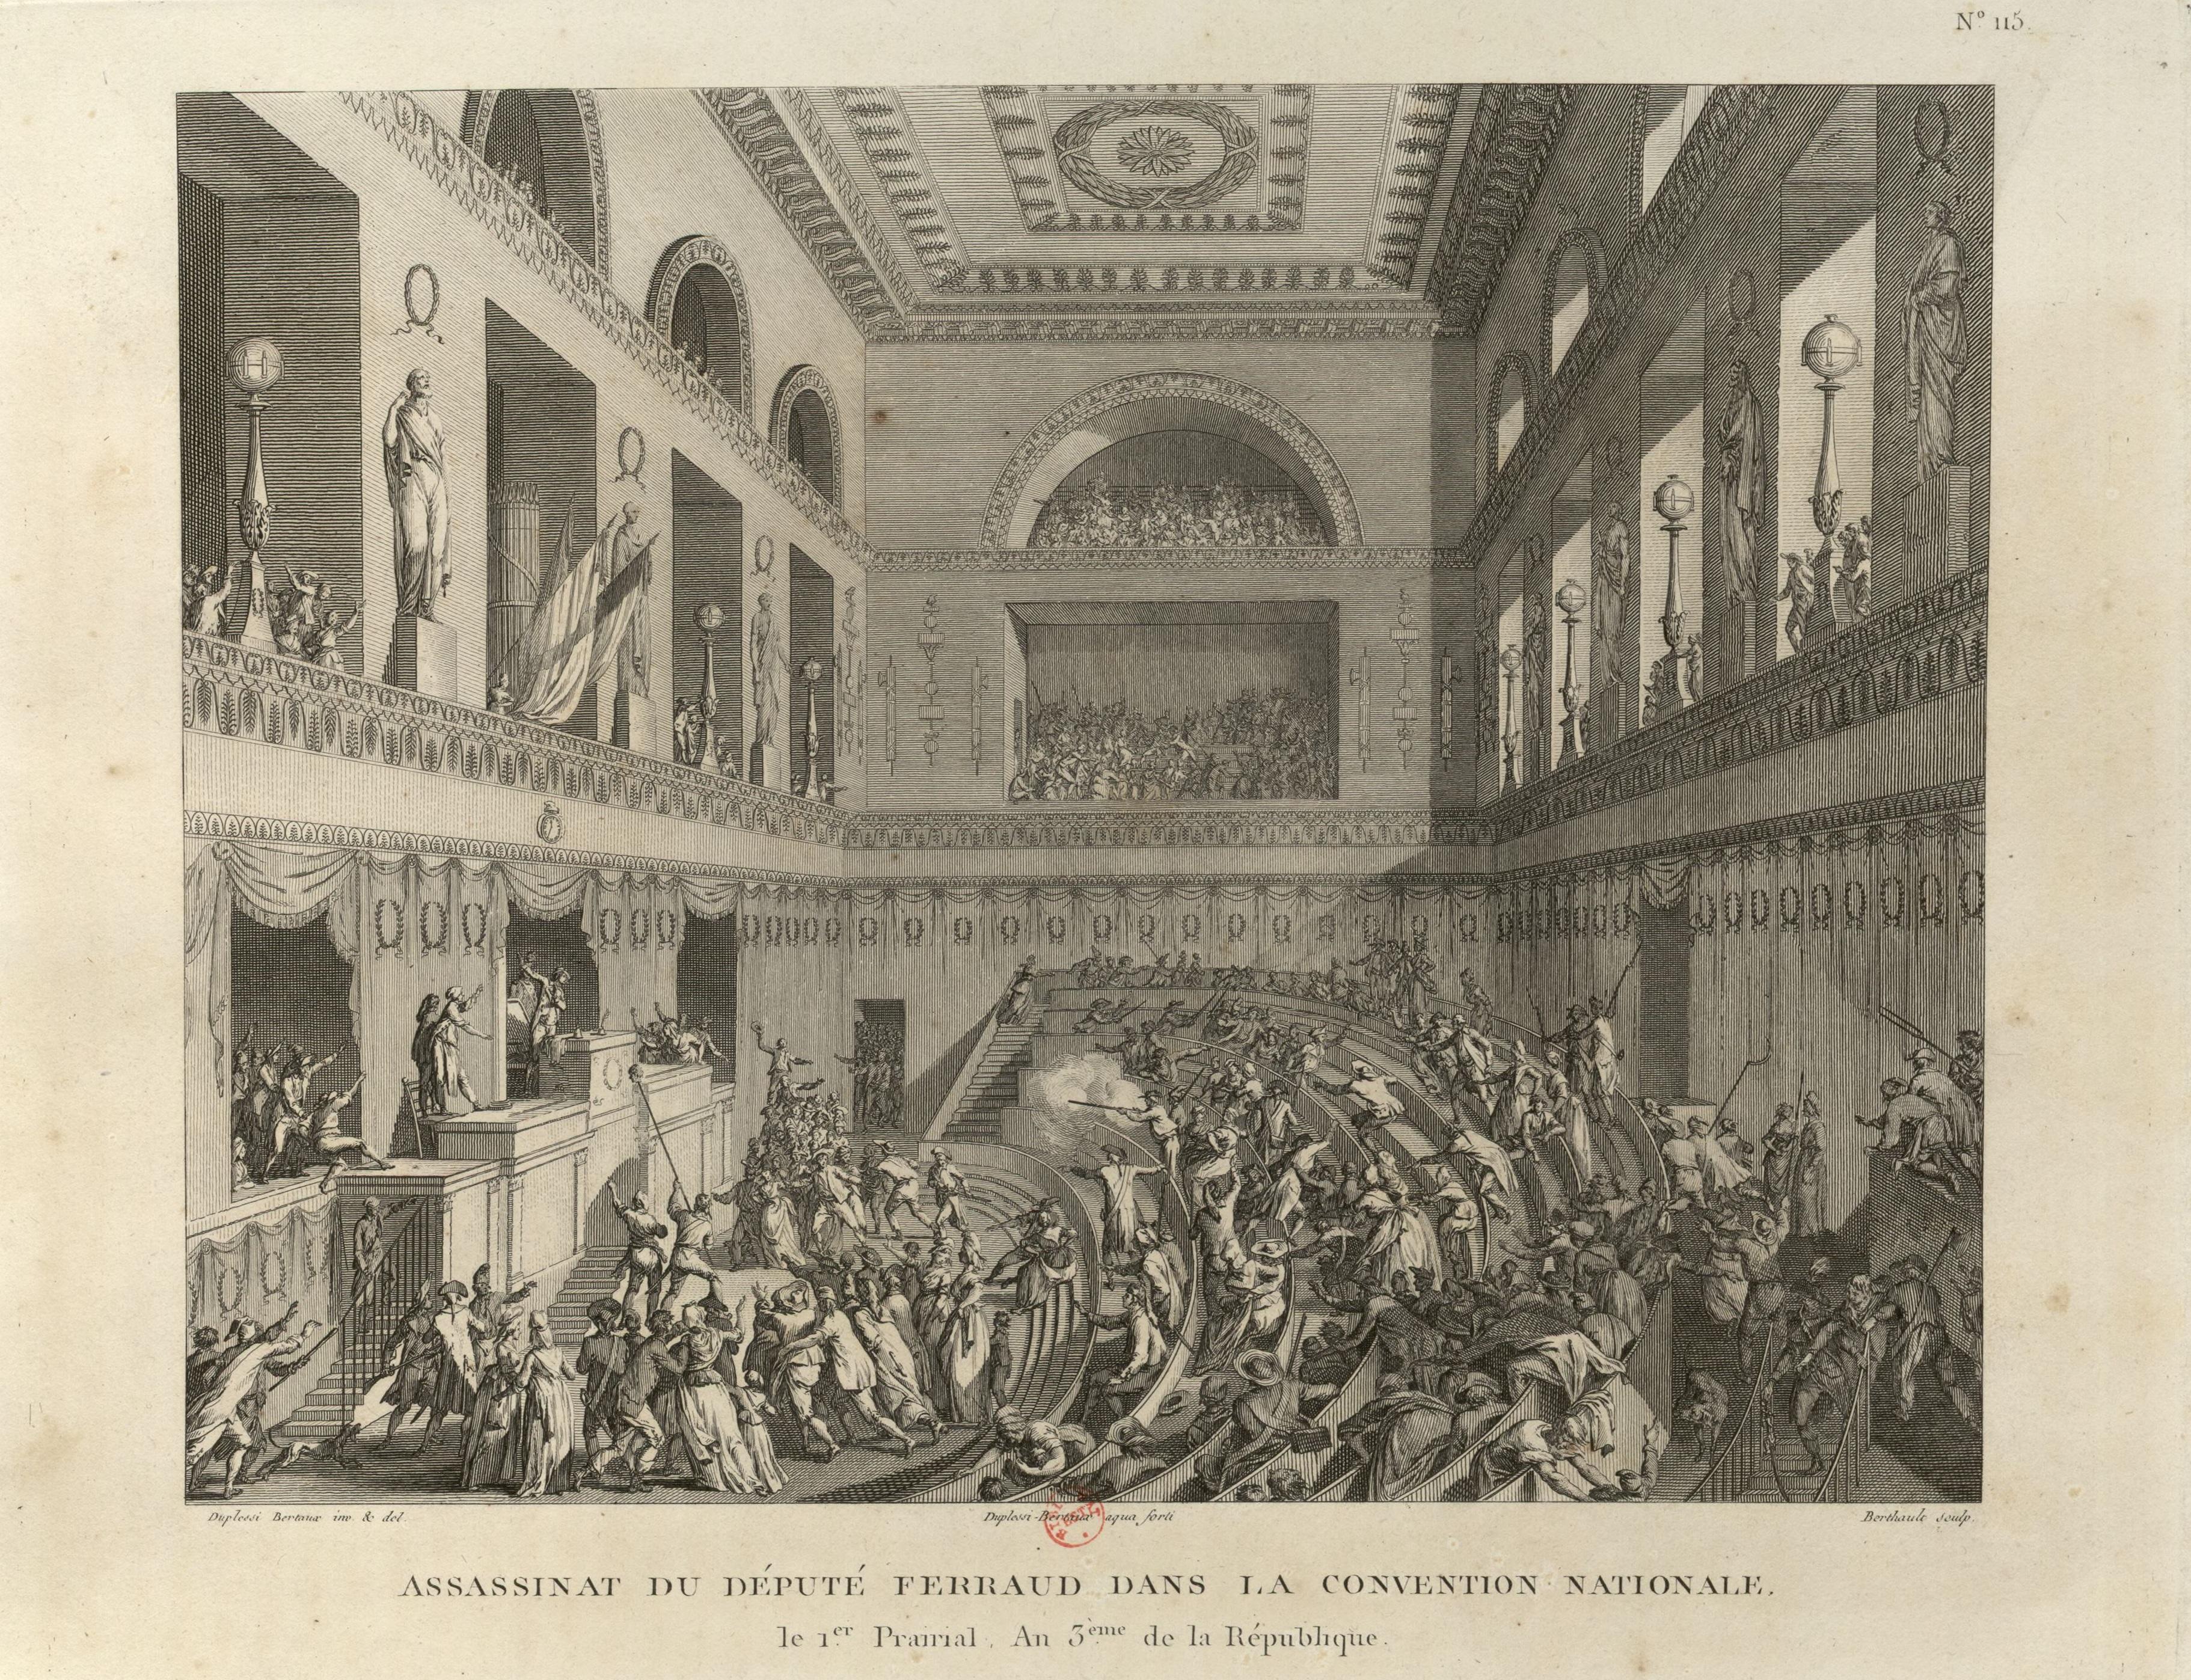 Artwork representing the Assassination of Jean Feraud in 1795